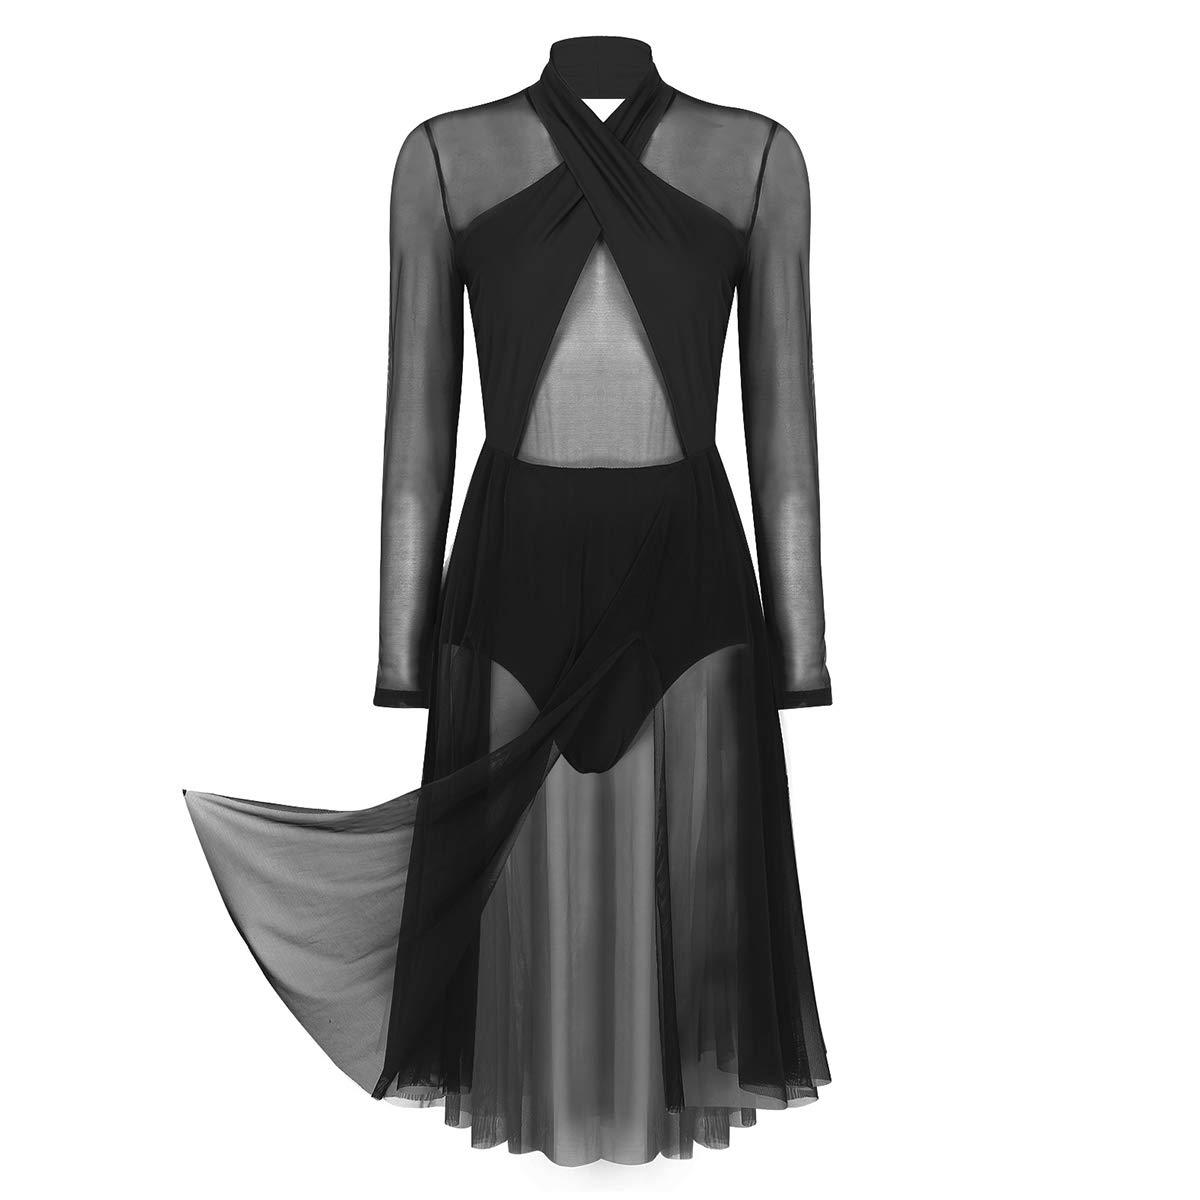 dPois Womens Adults Mesh Halter Neck Leotard Warp Dress Lyrical Modern Contemporary Dance Costume